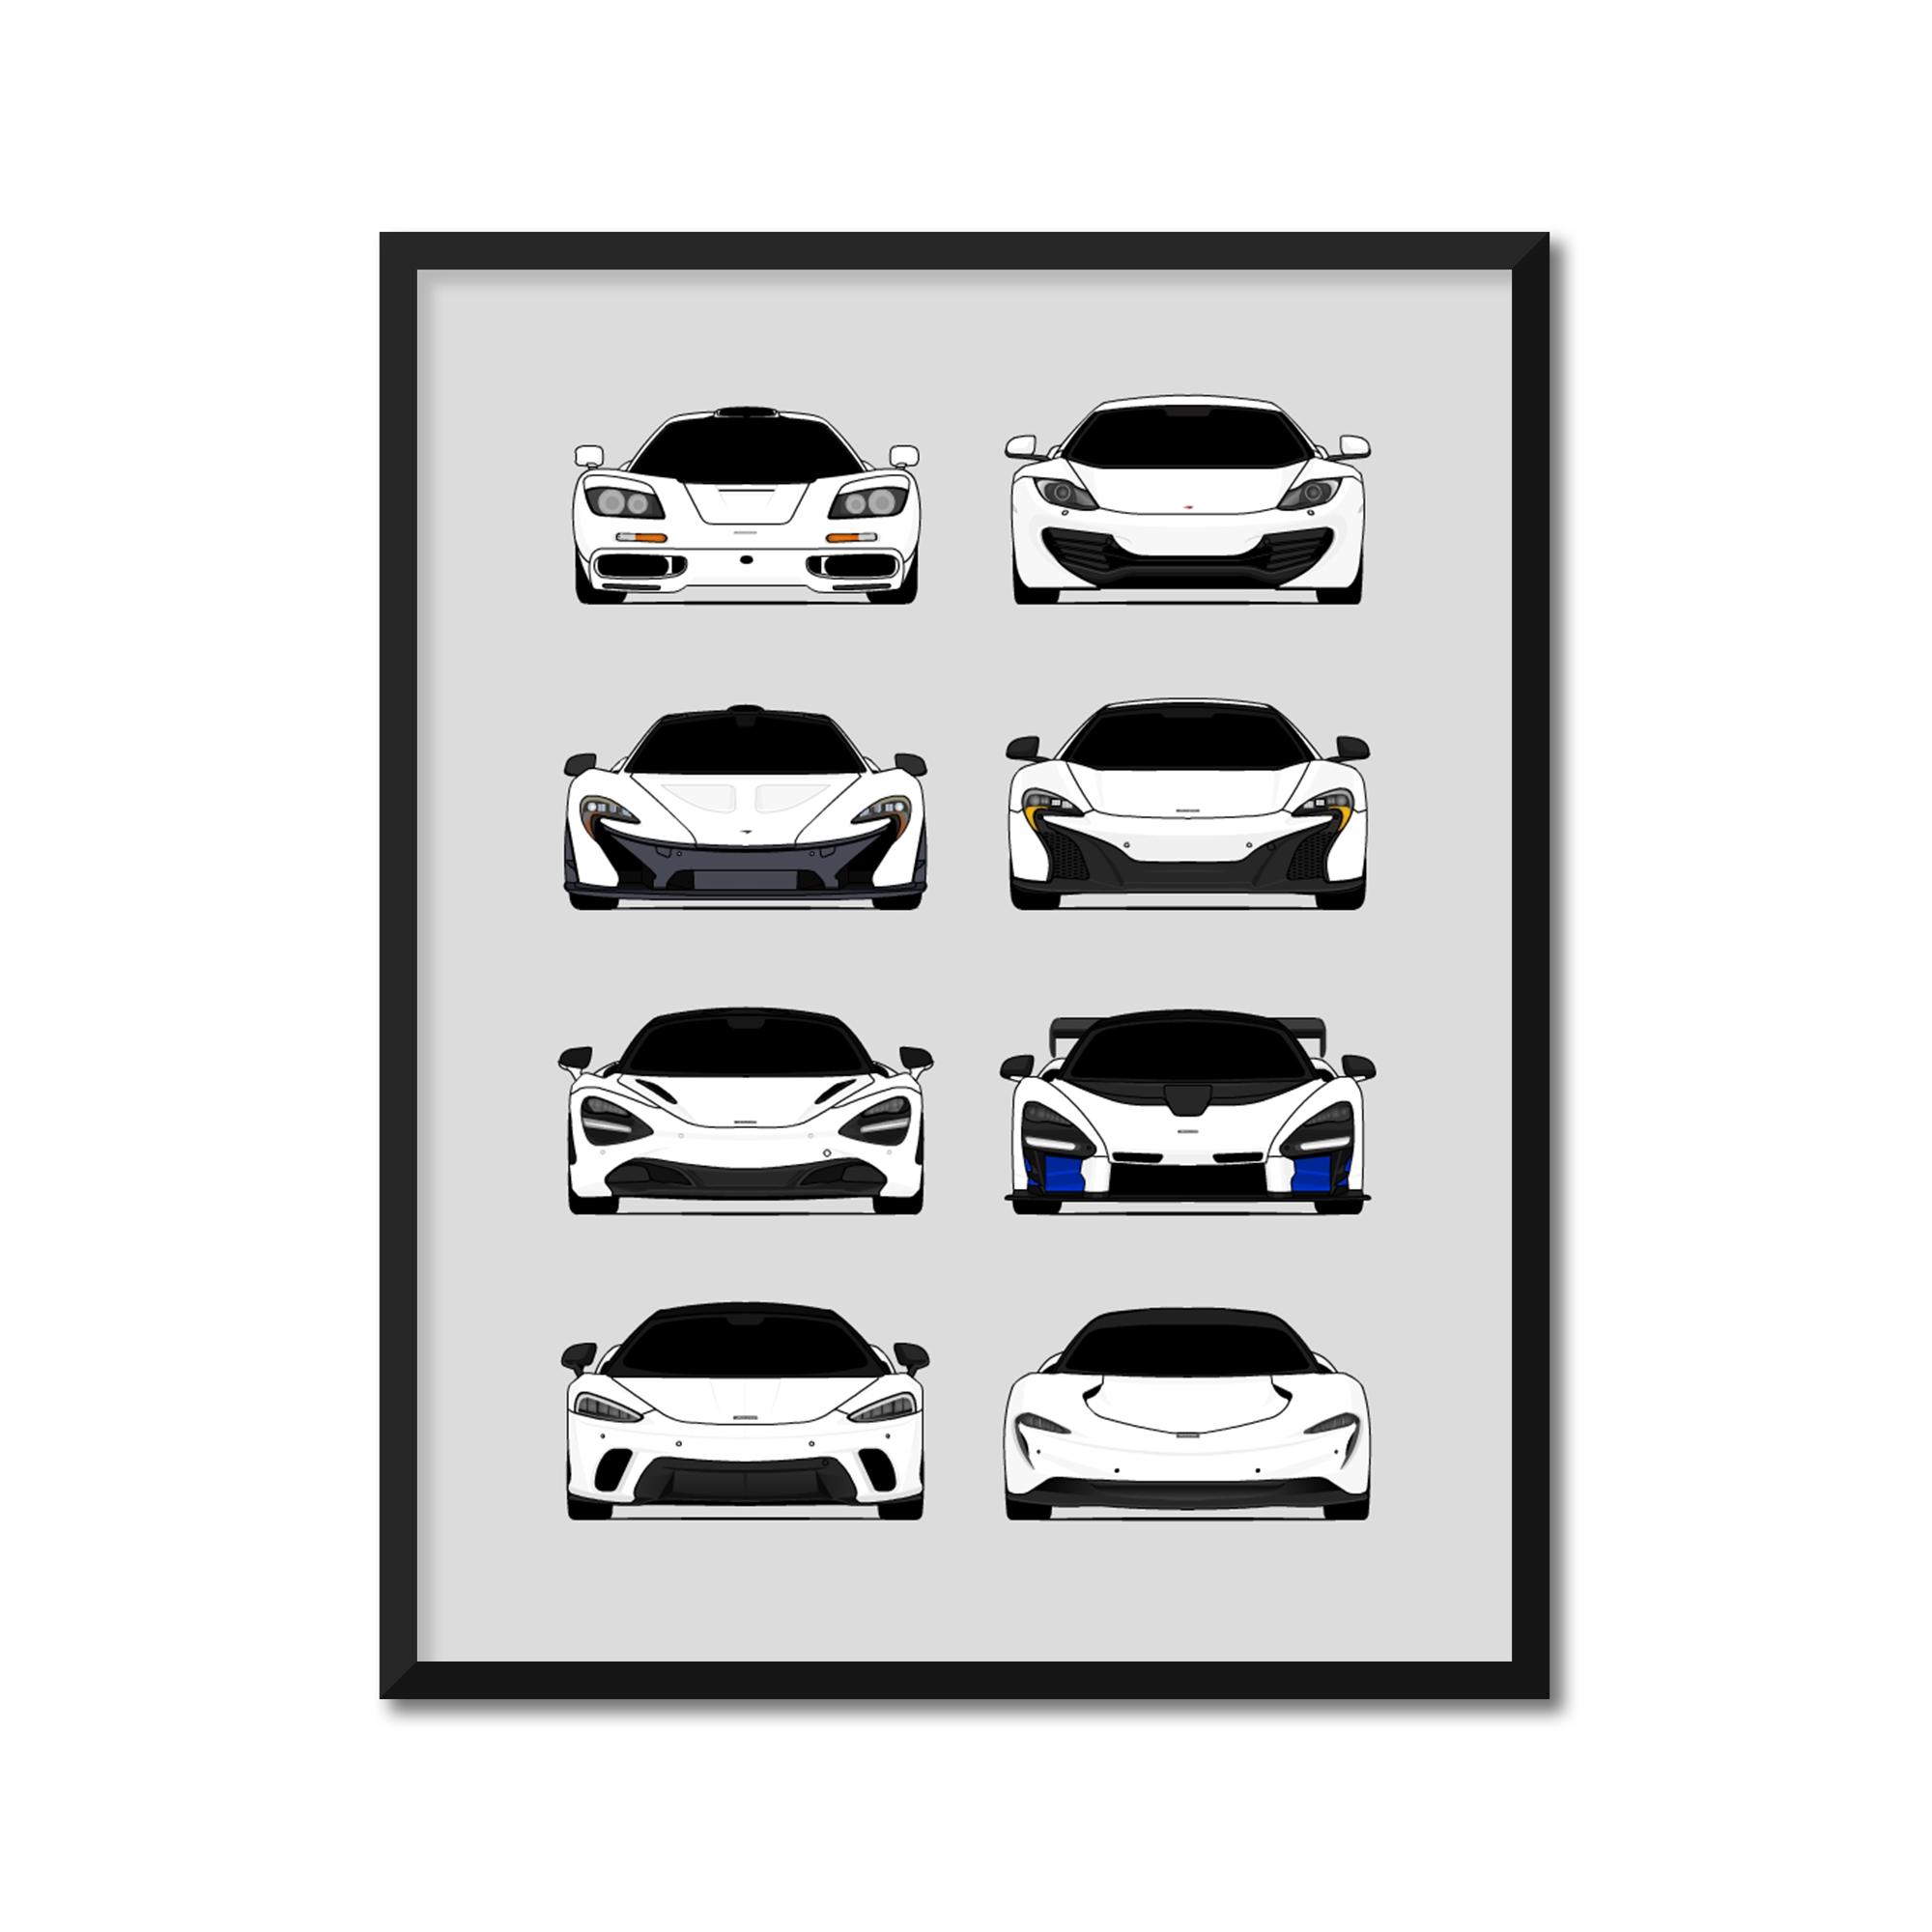 F1, MP4-12C, F1, 650S, 720S, Senna, GT, Speedtail McLaren Generations Inspired Poster Print Wall Art Handmade Decor of the History and Evolution of McLaren Automotive